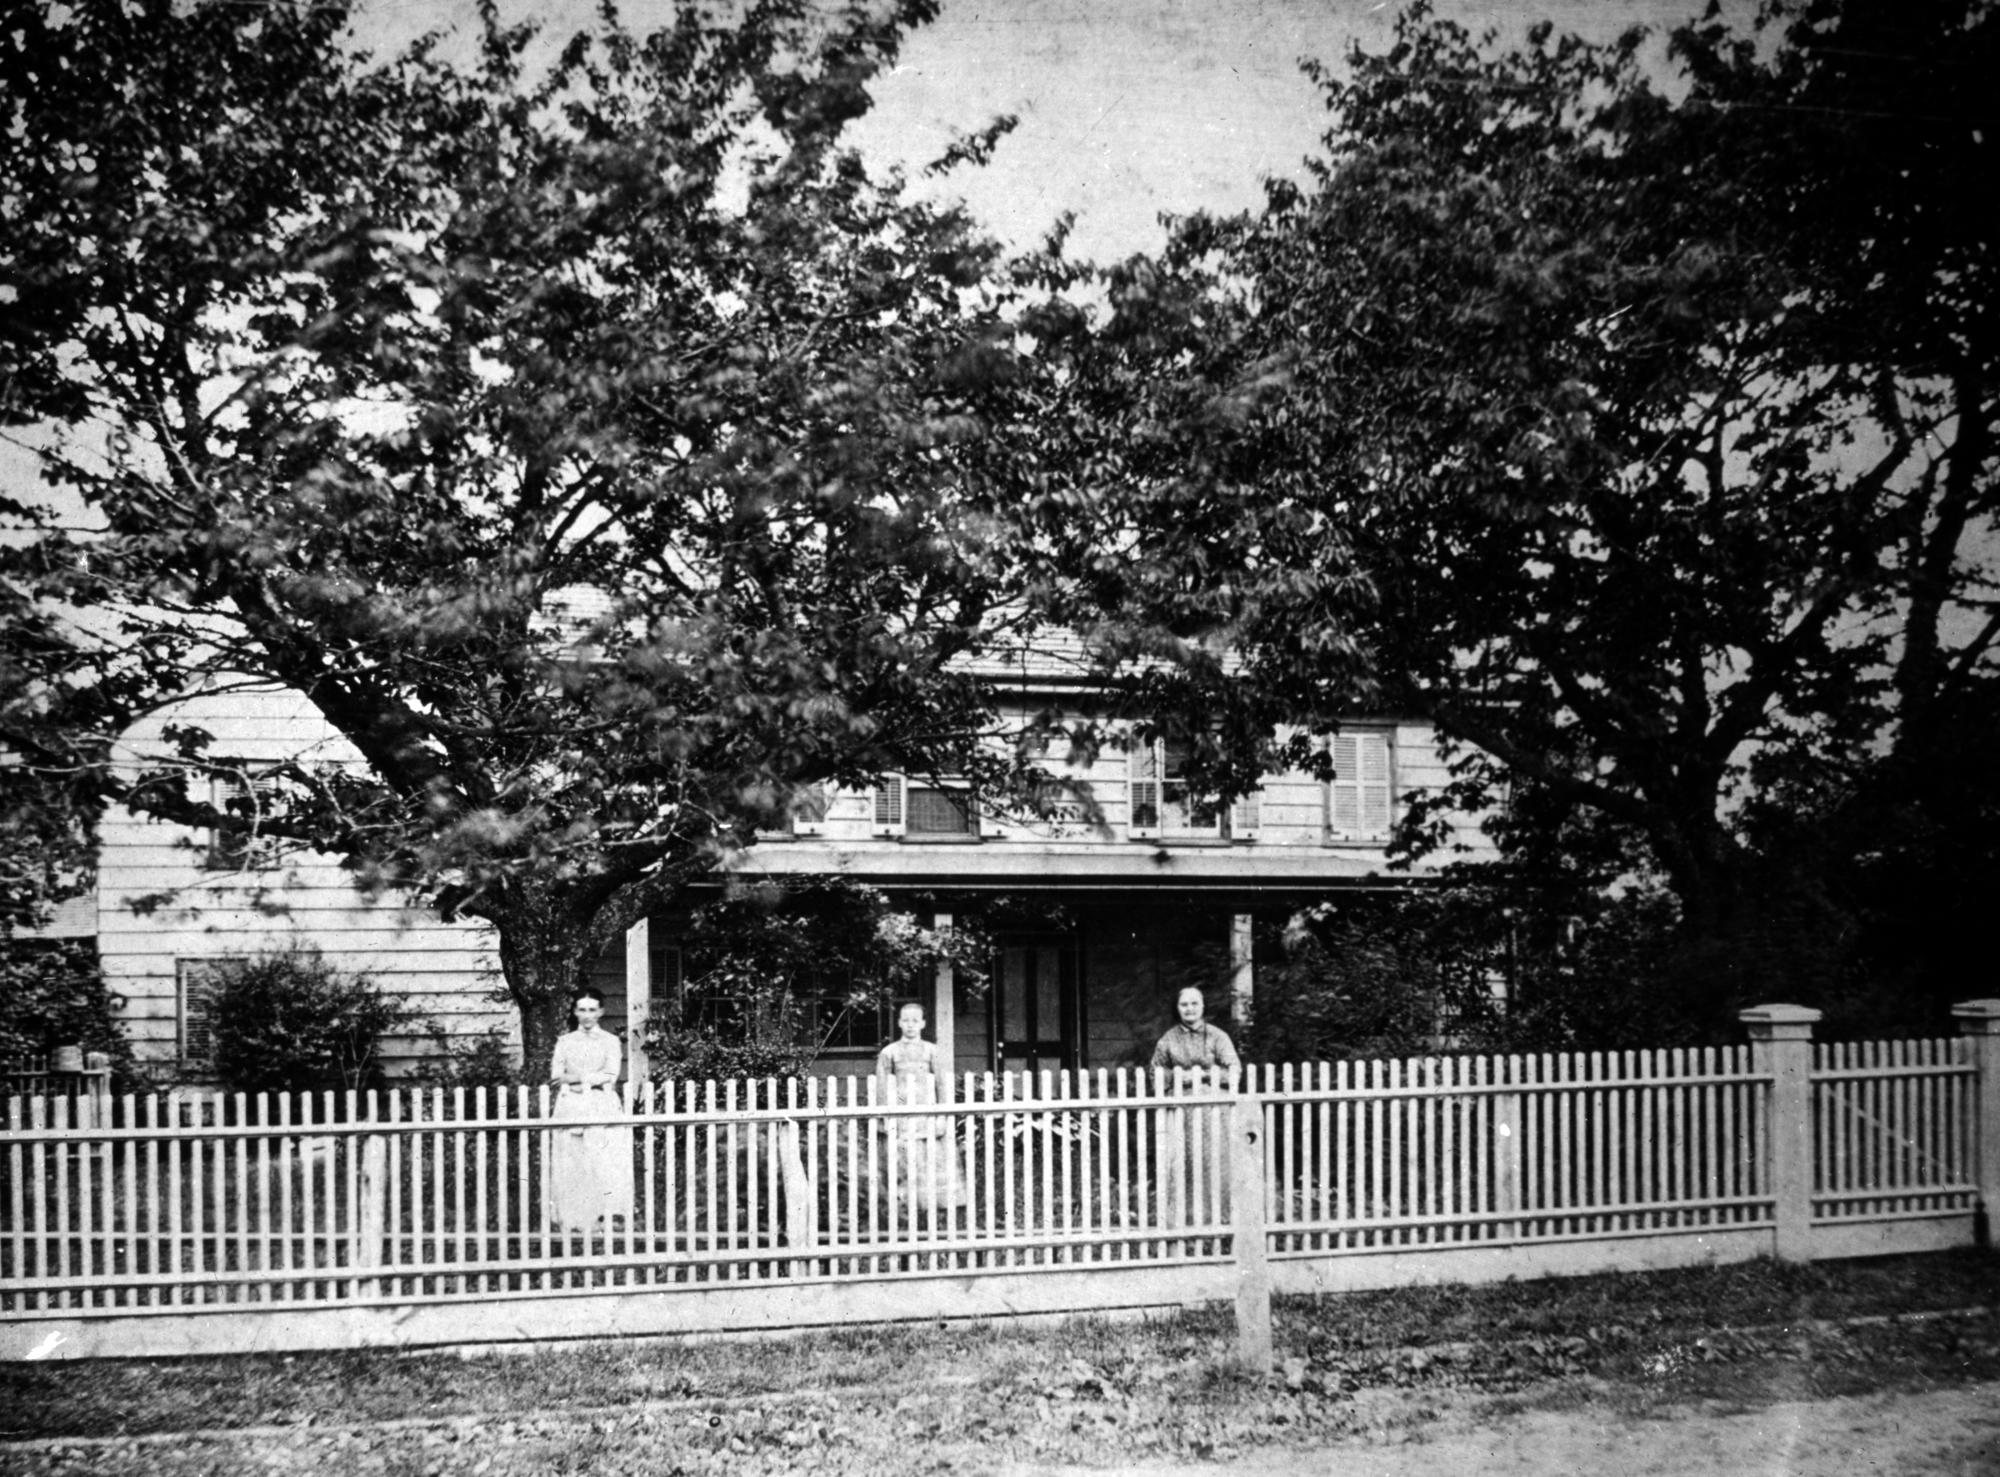 Left to right:Sarah Cornell Bates Hyatt, unidentified woman, Sarah Odell Hyatt.